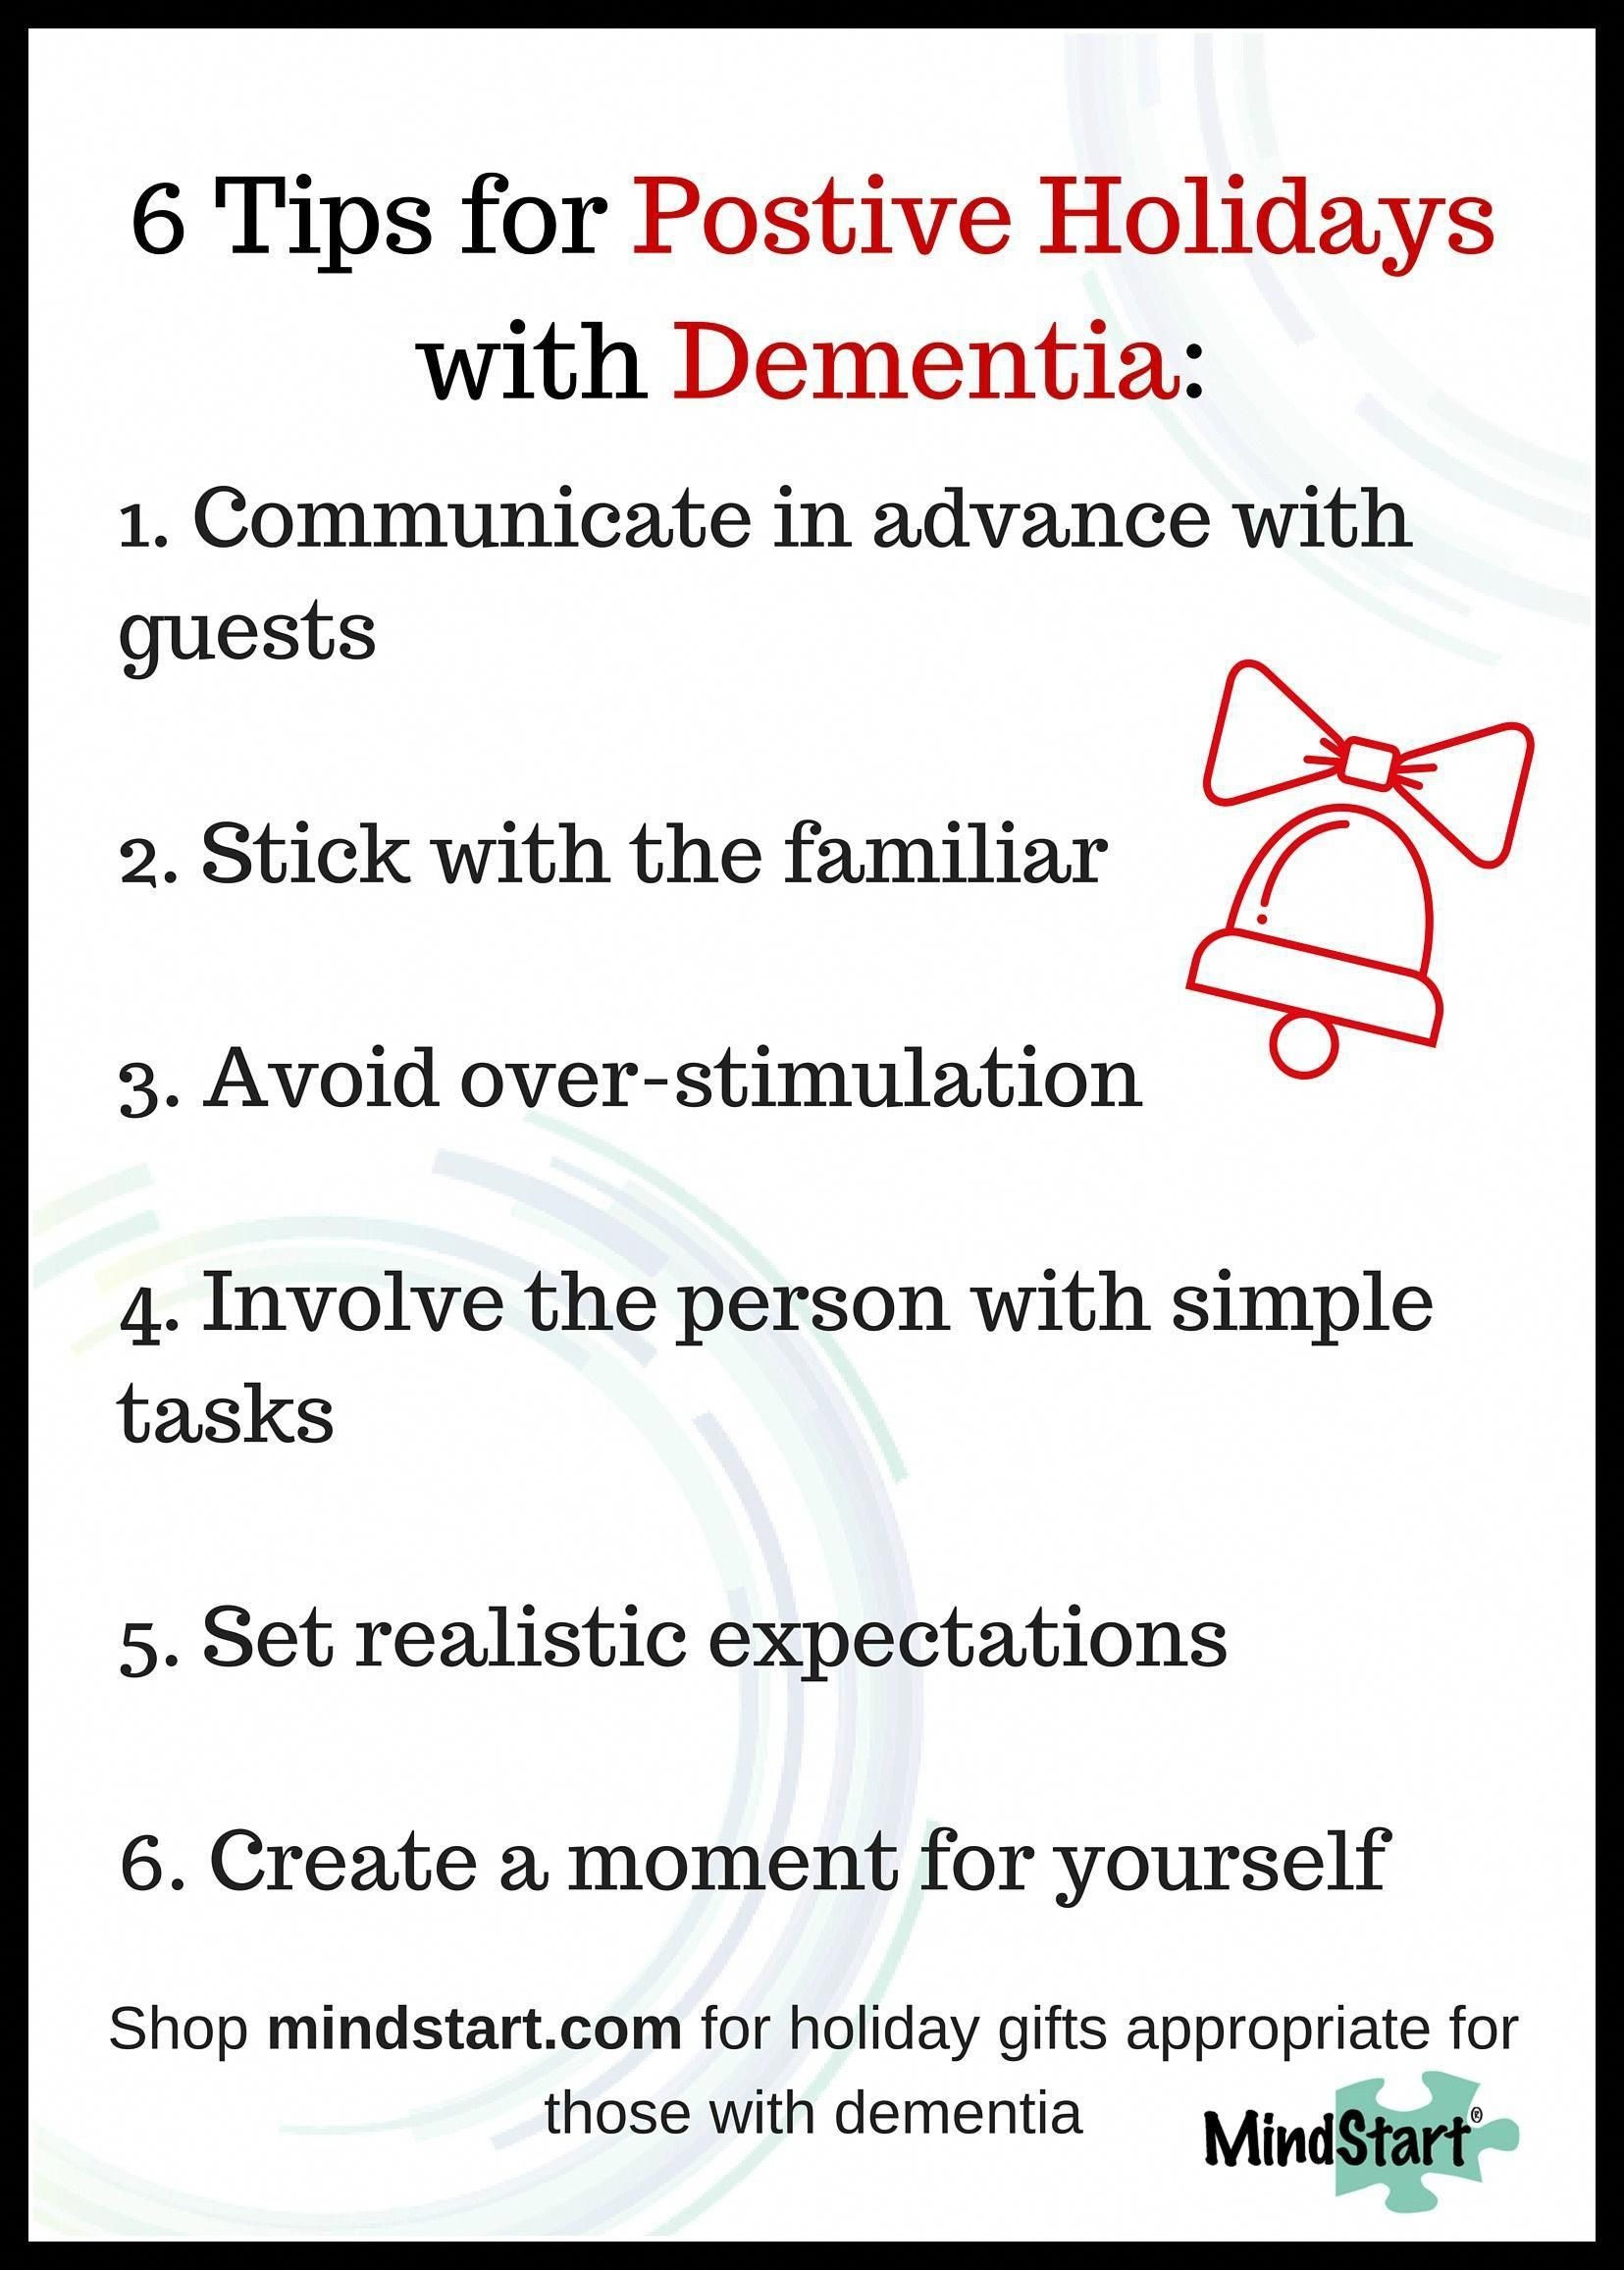 Caregiver tips for holidays and dementia elderlycaregiver